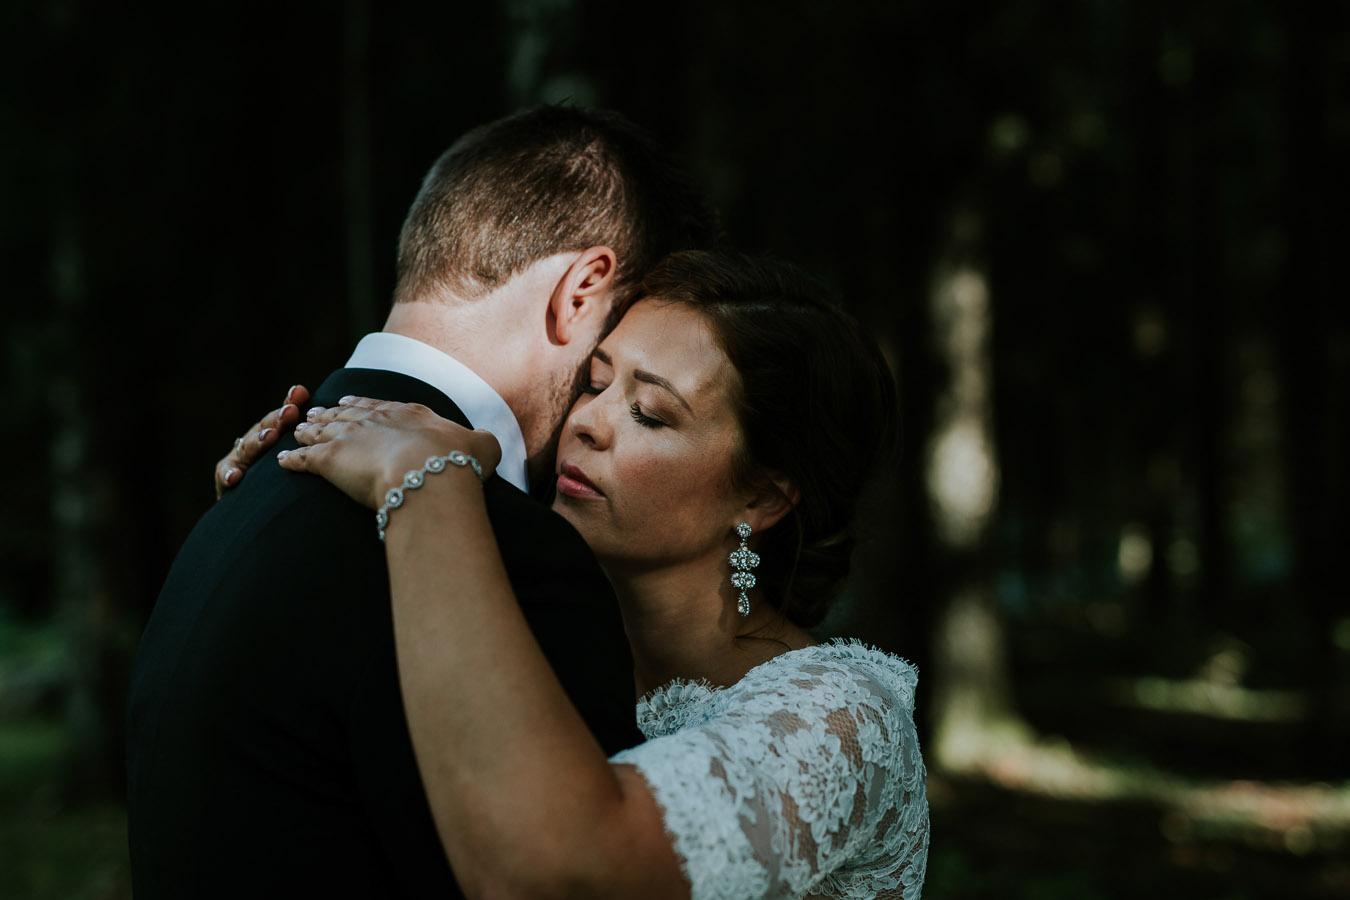 Fotograf-Tone-Tvedt-bryllup-185.jpg